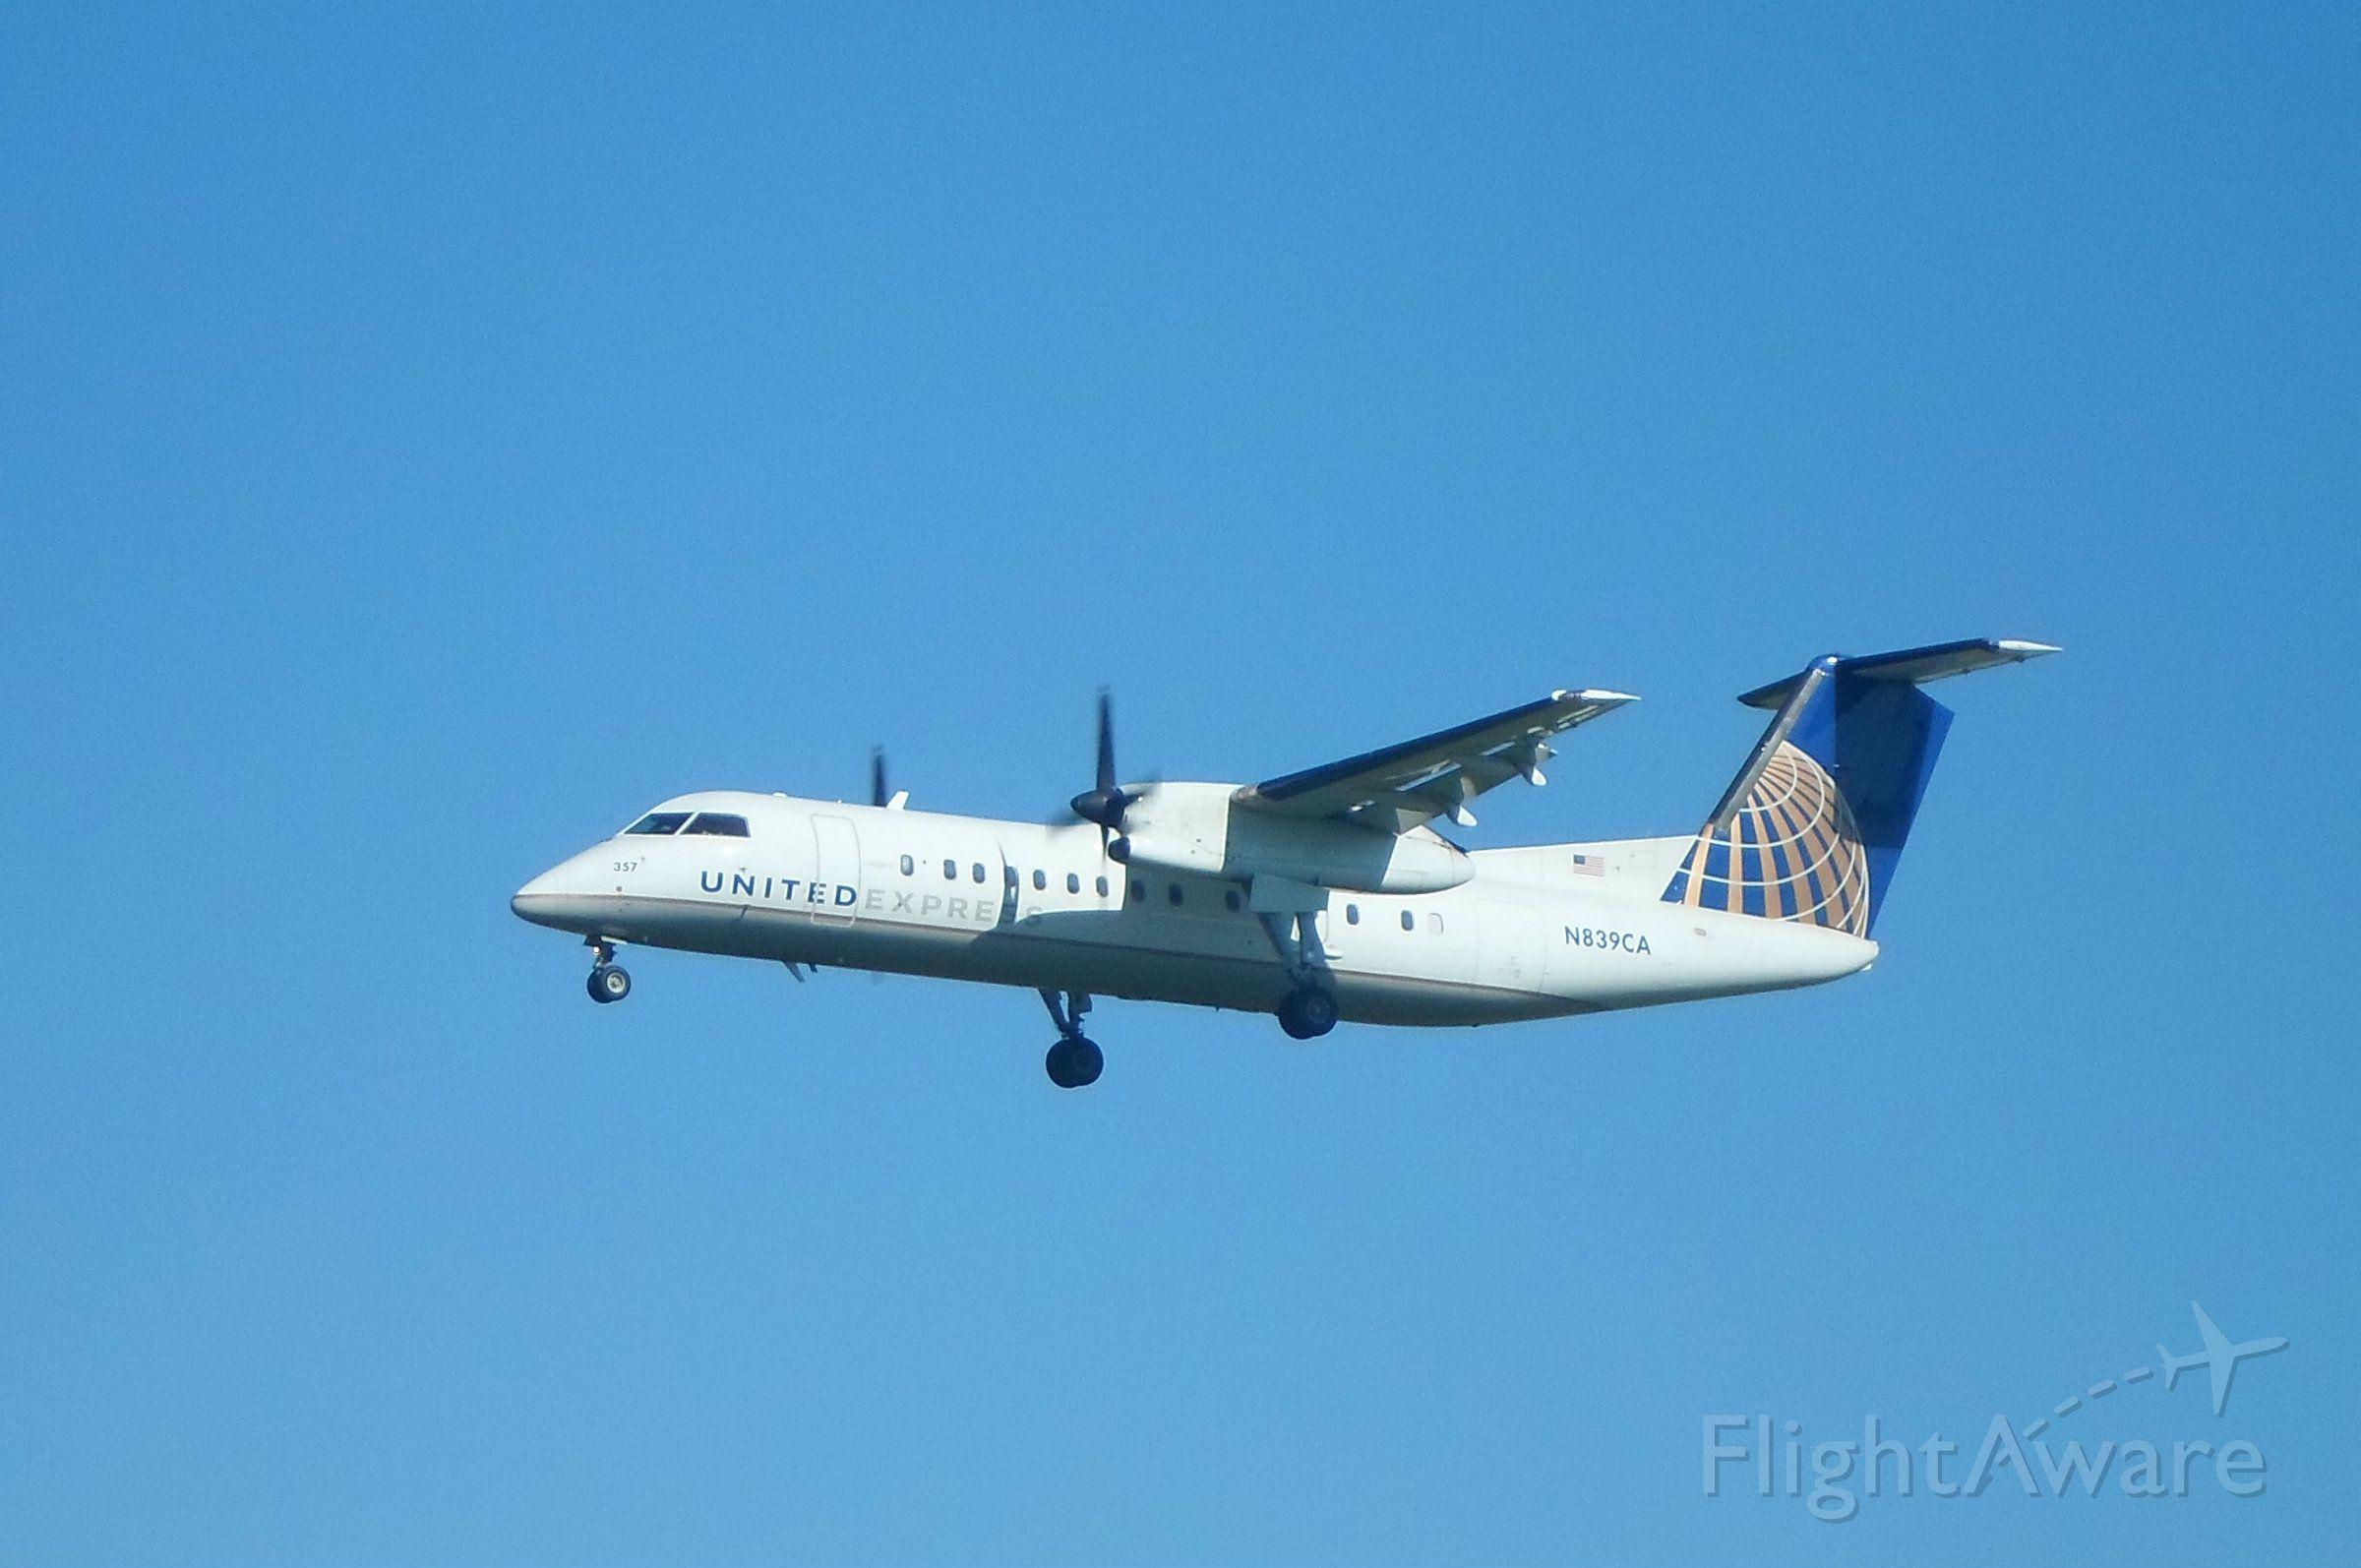 de Havilland Dash 8-300 (N839CA) - A United Express (Commutair) Dash 8 arrives at Albany International Airport on Runway 1.